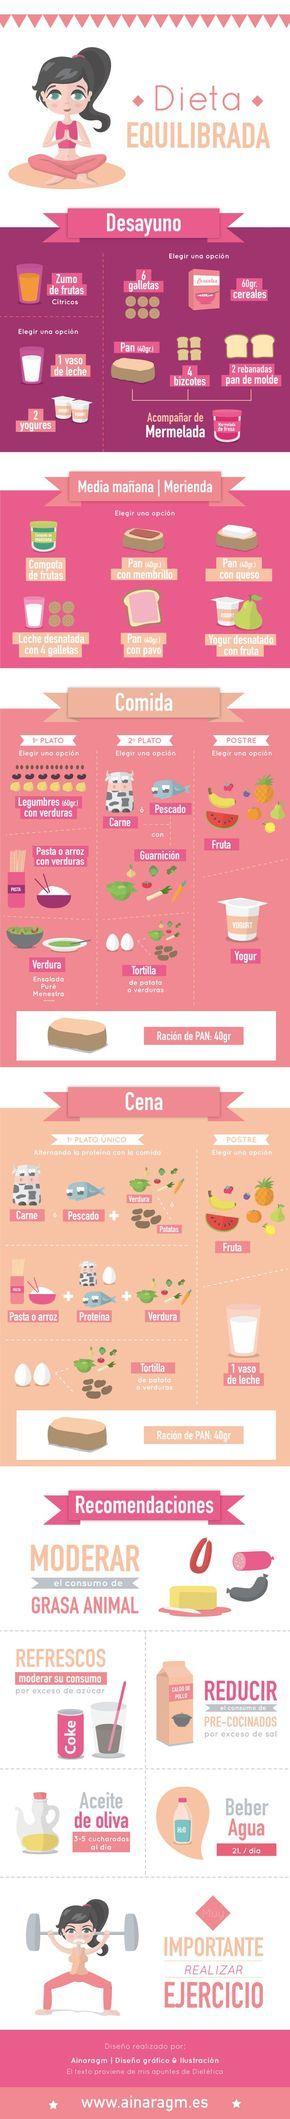 infografia una dieta equilibrada - Dieta equilibrada, Te..